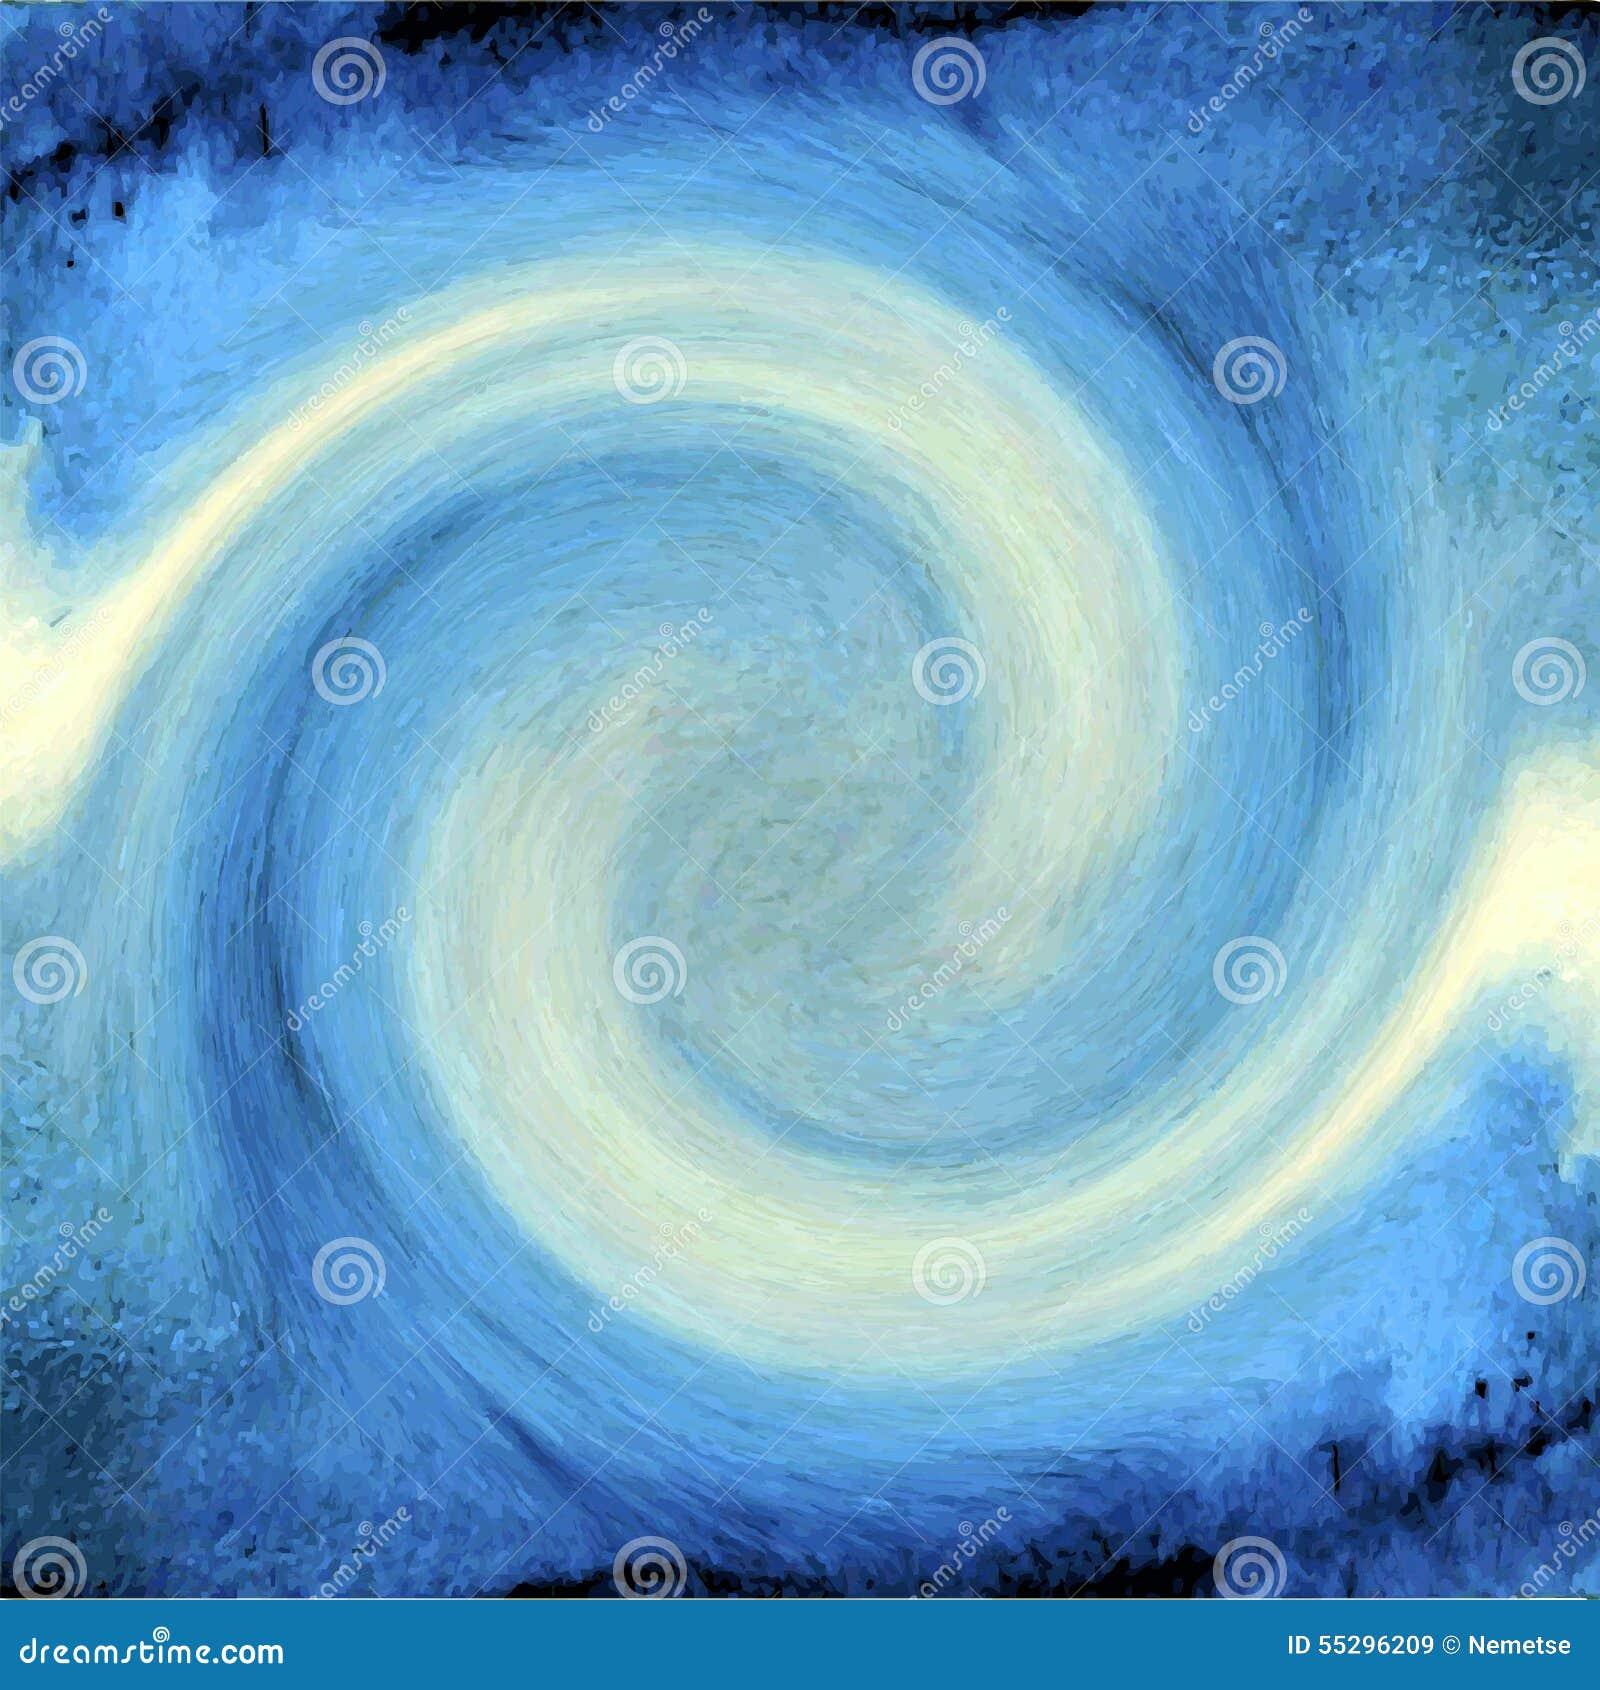 blue grunge watercolor background stock vector image 55296209. Black Bedroom Furniture Sets. Home Design Ideas